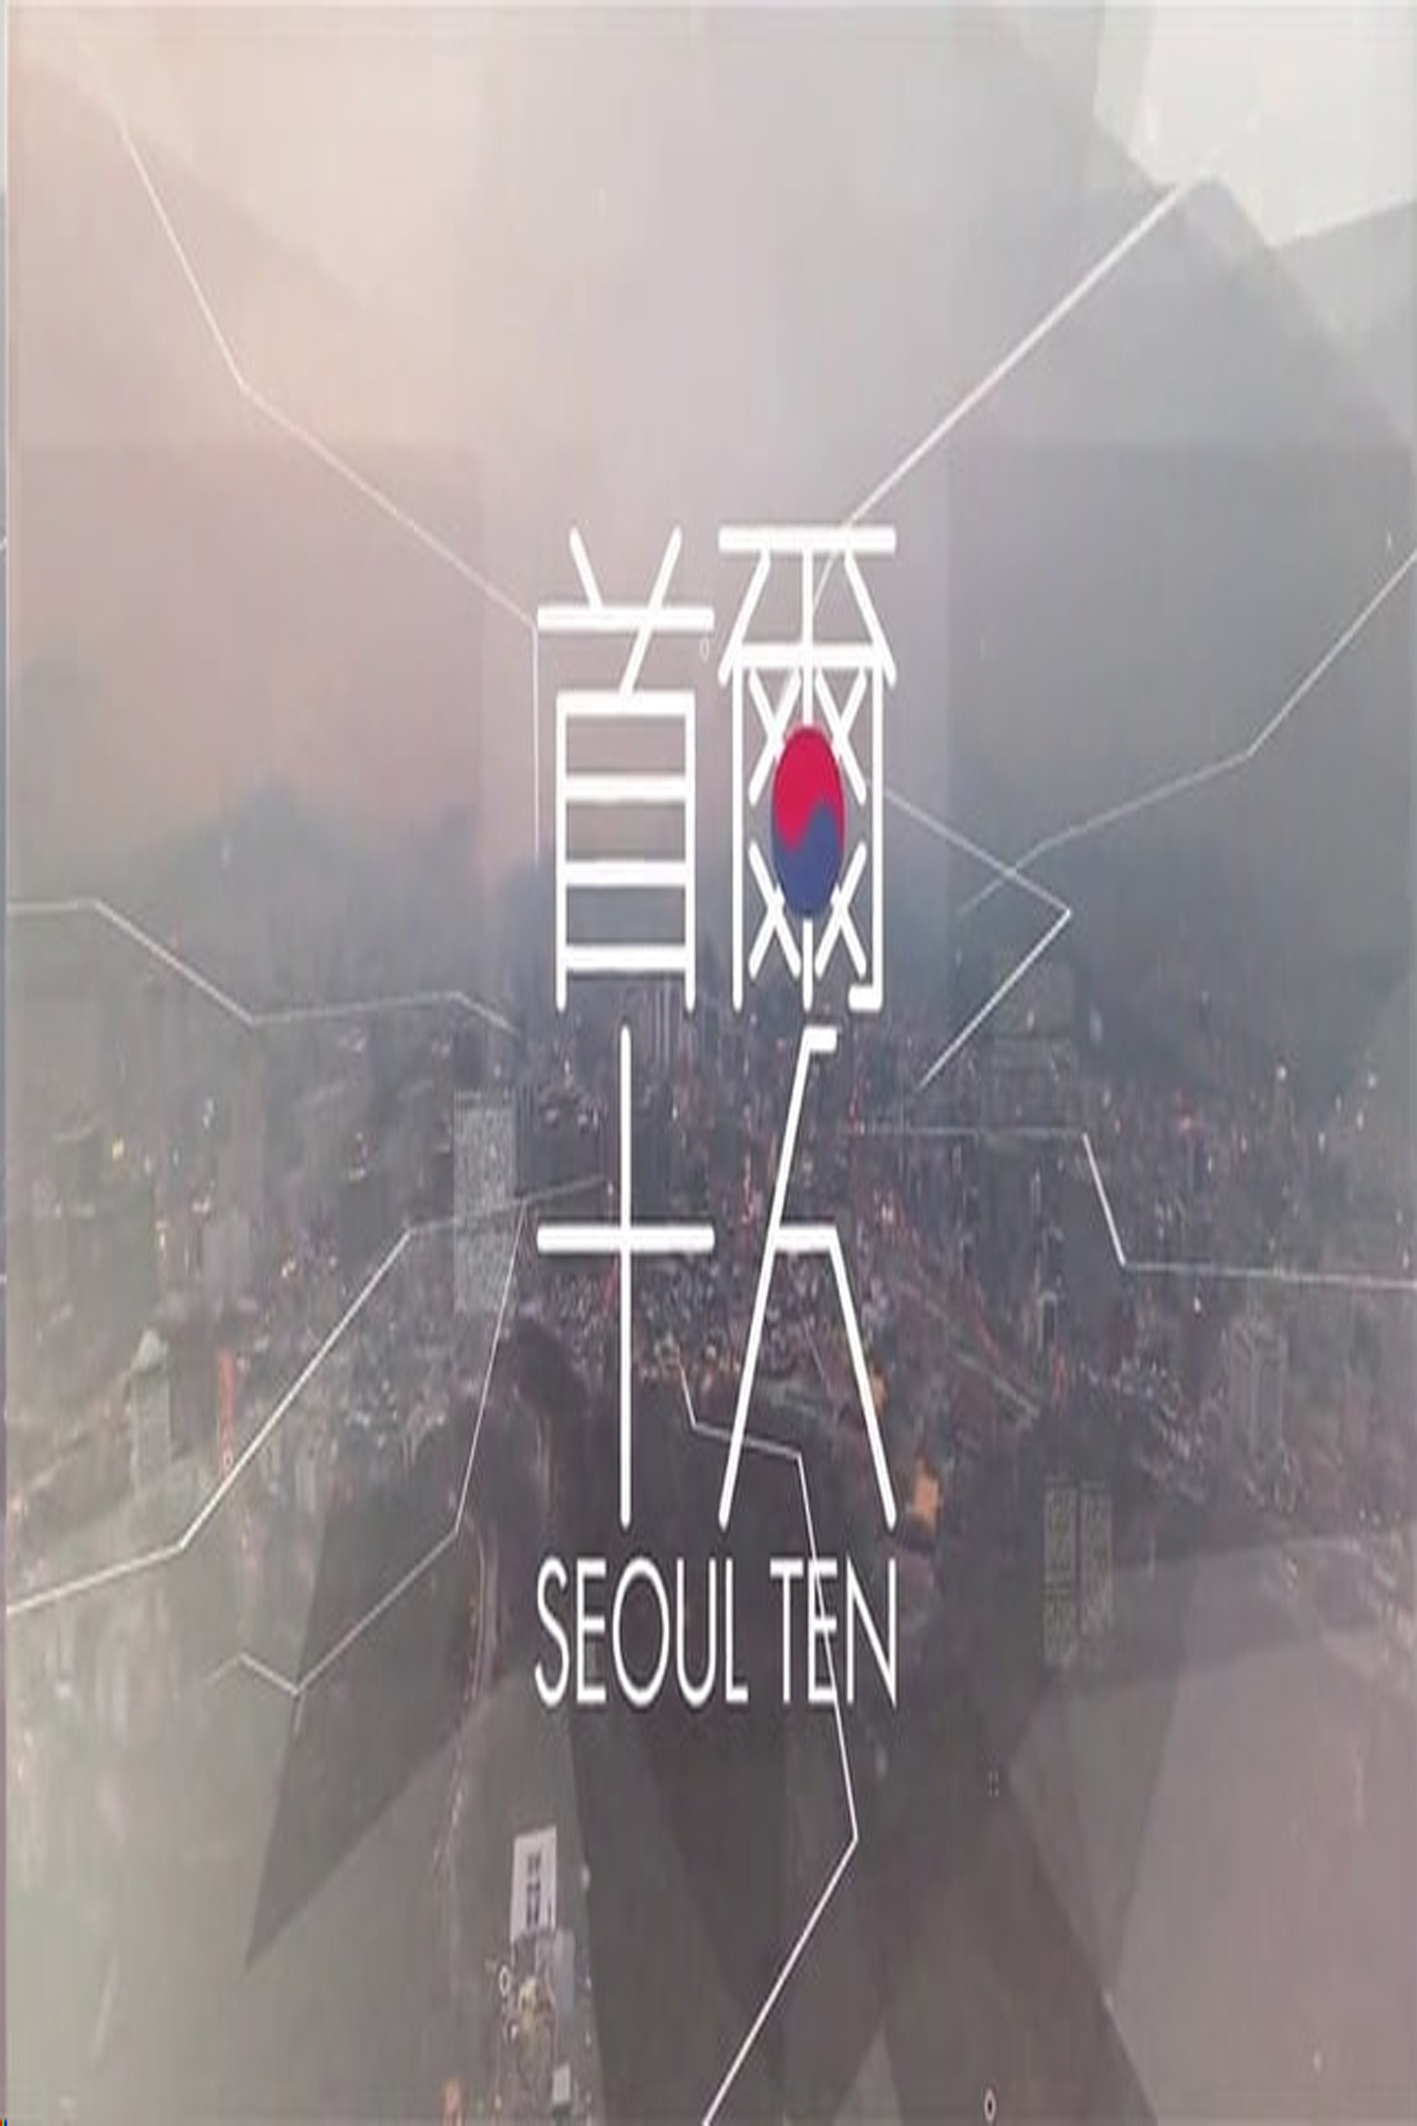 Seoul Ten - 首爾十人